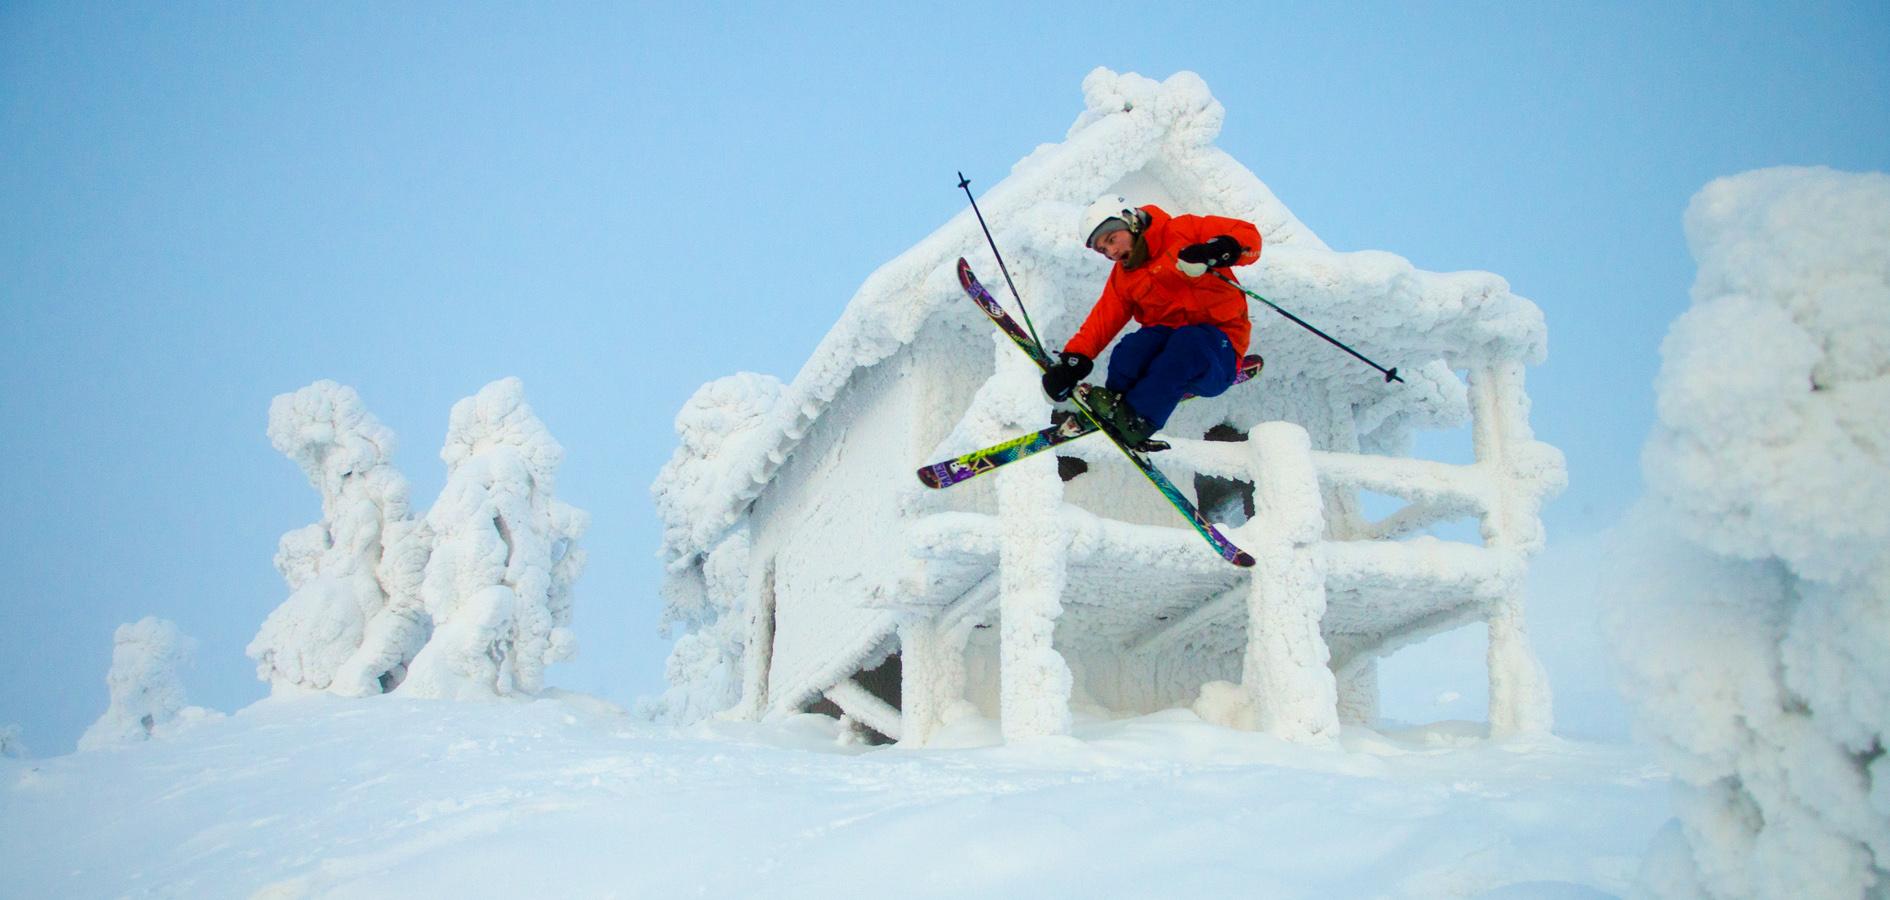 Mäenlasku on talviurheilulaji